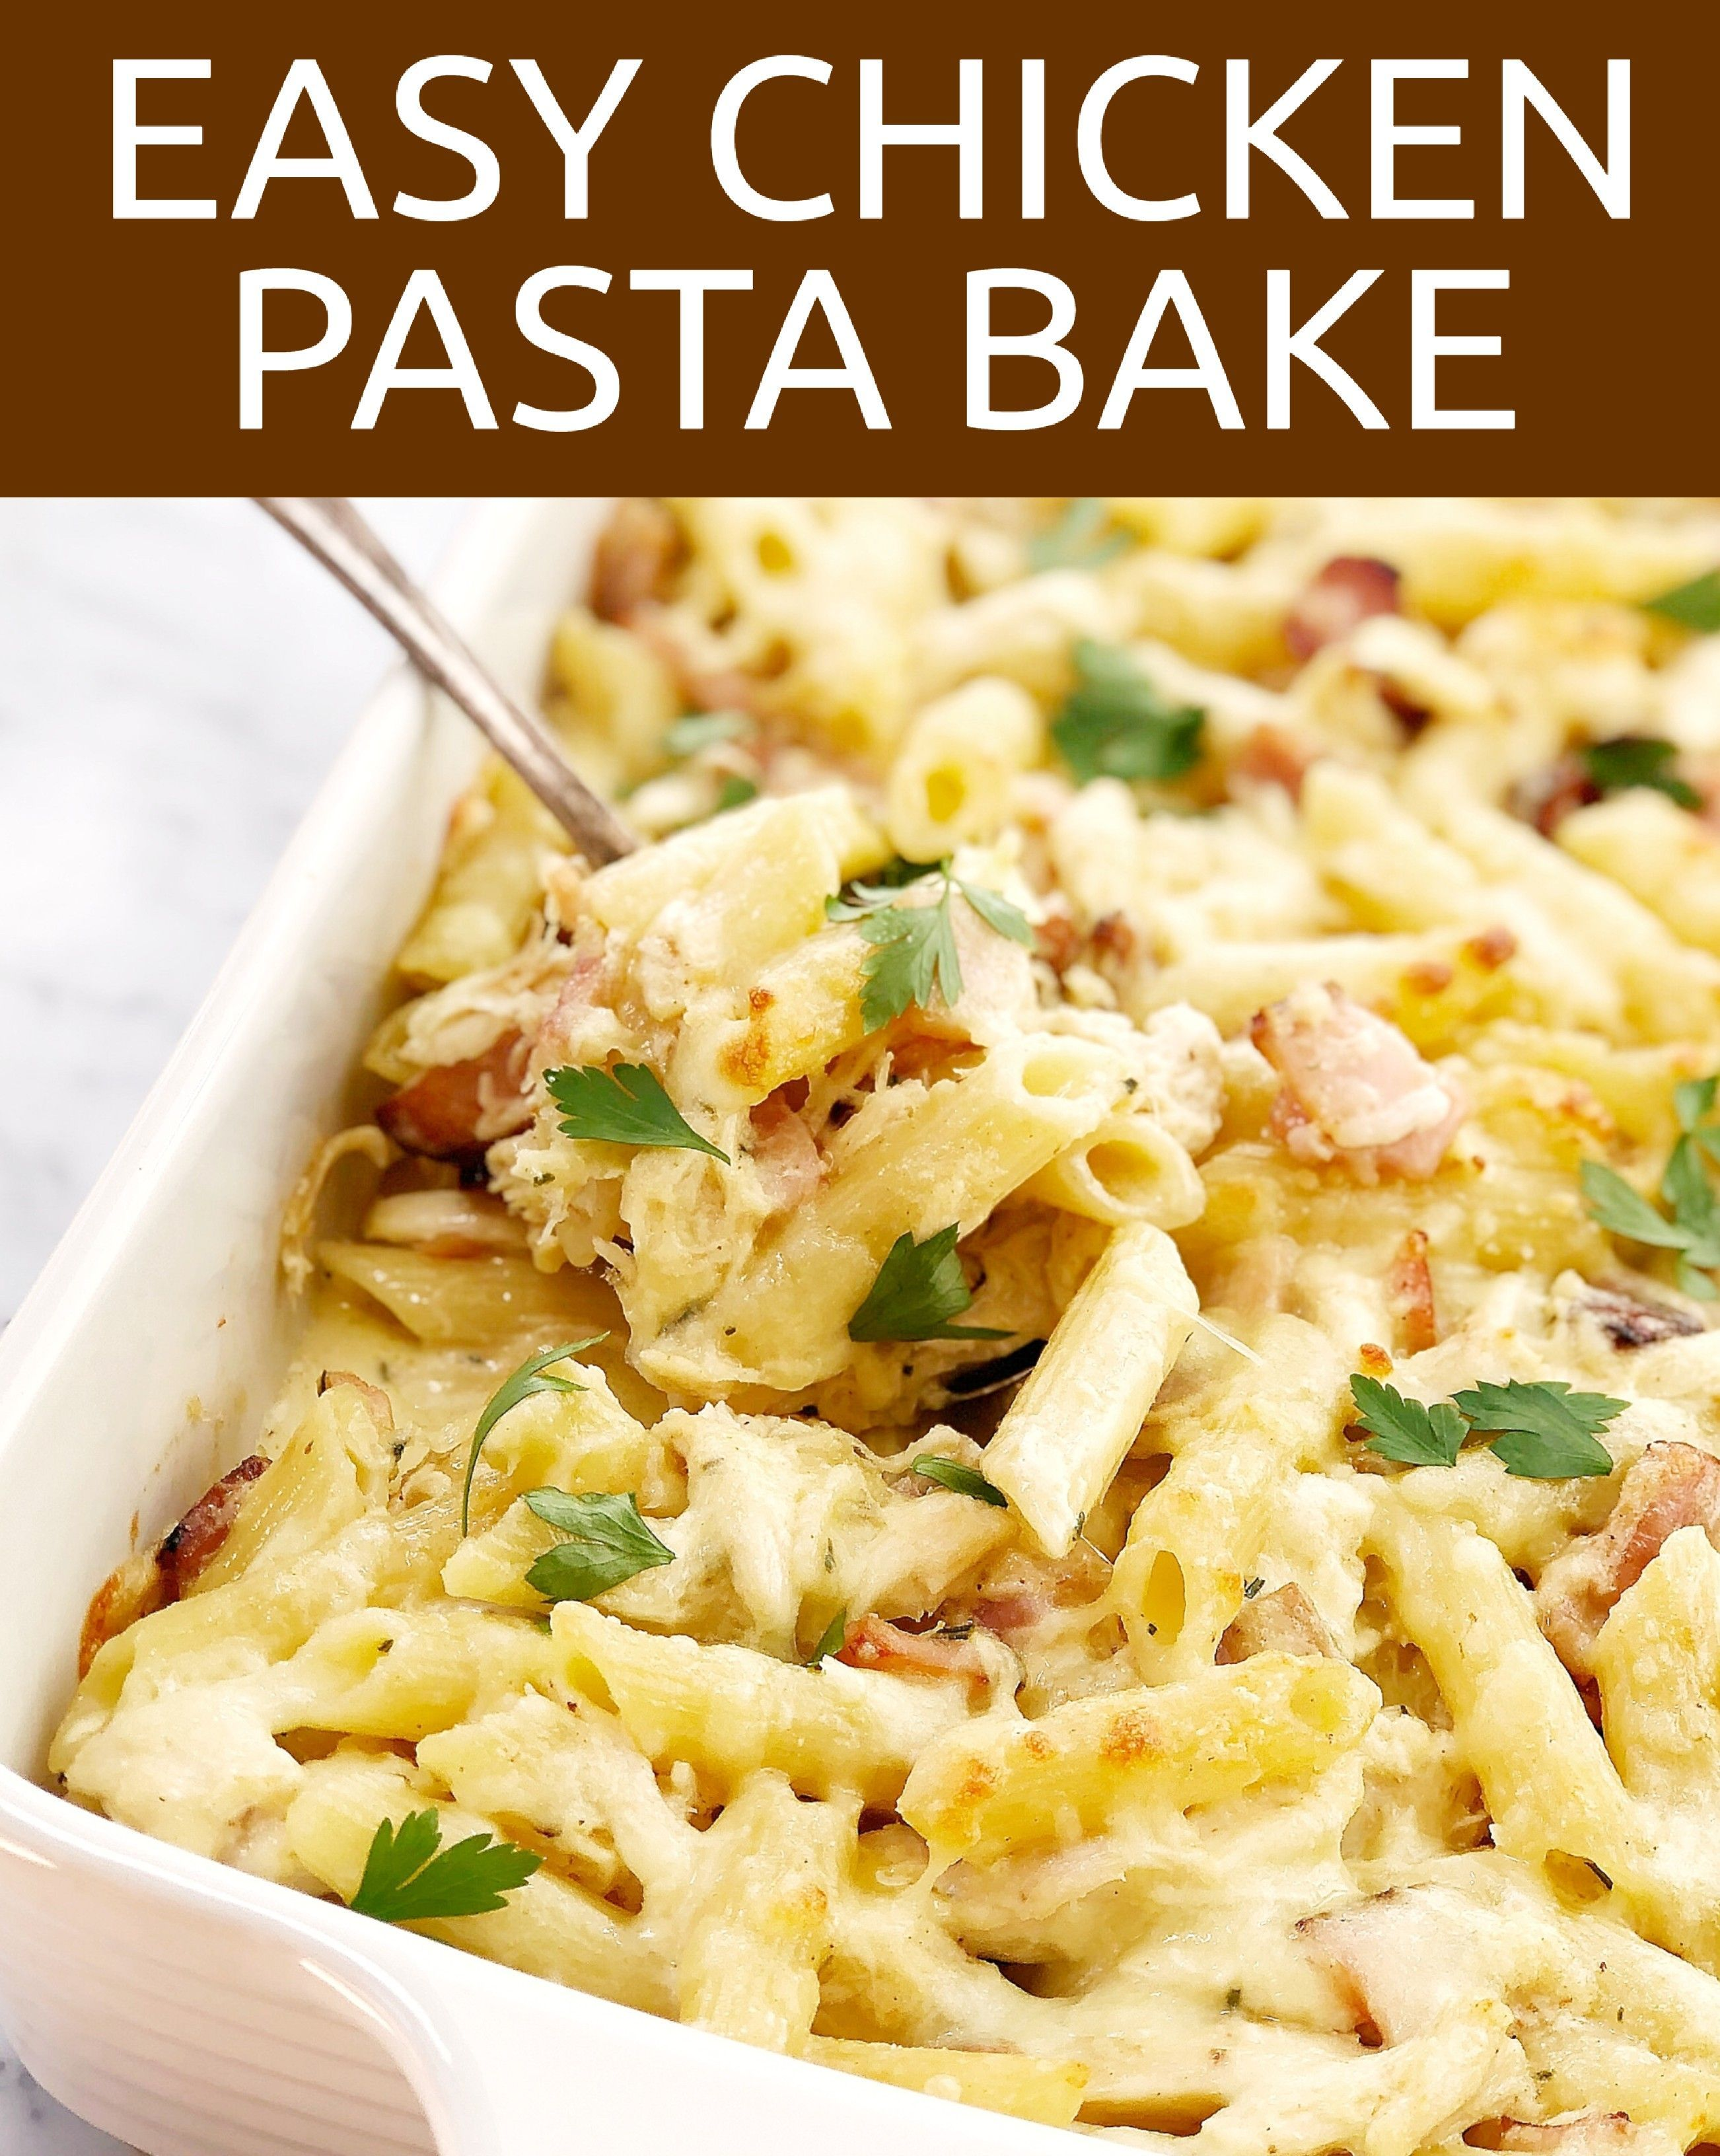 Easy Creamy Chicken Pasta Bake Chef Not Required Recipe Creamy Chicken Pasta Easy Chicken Pasta Bake Chicken Pasta Bake